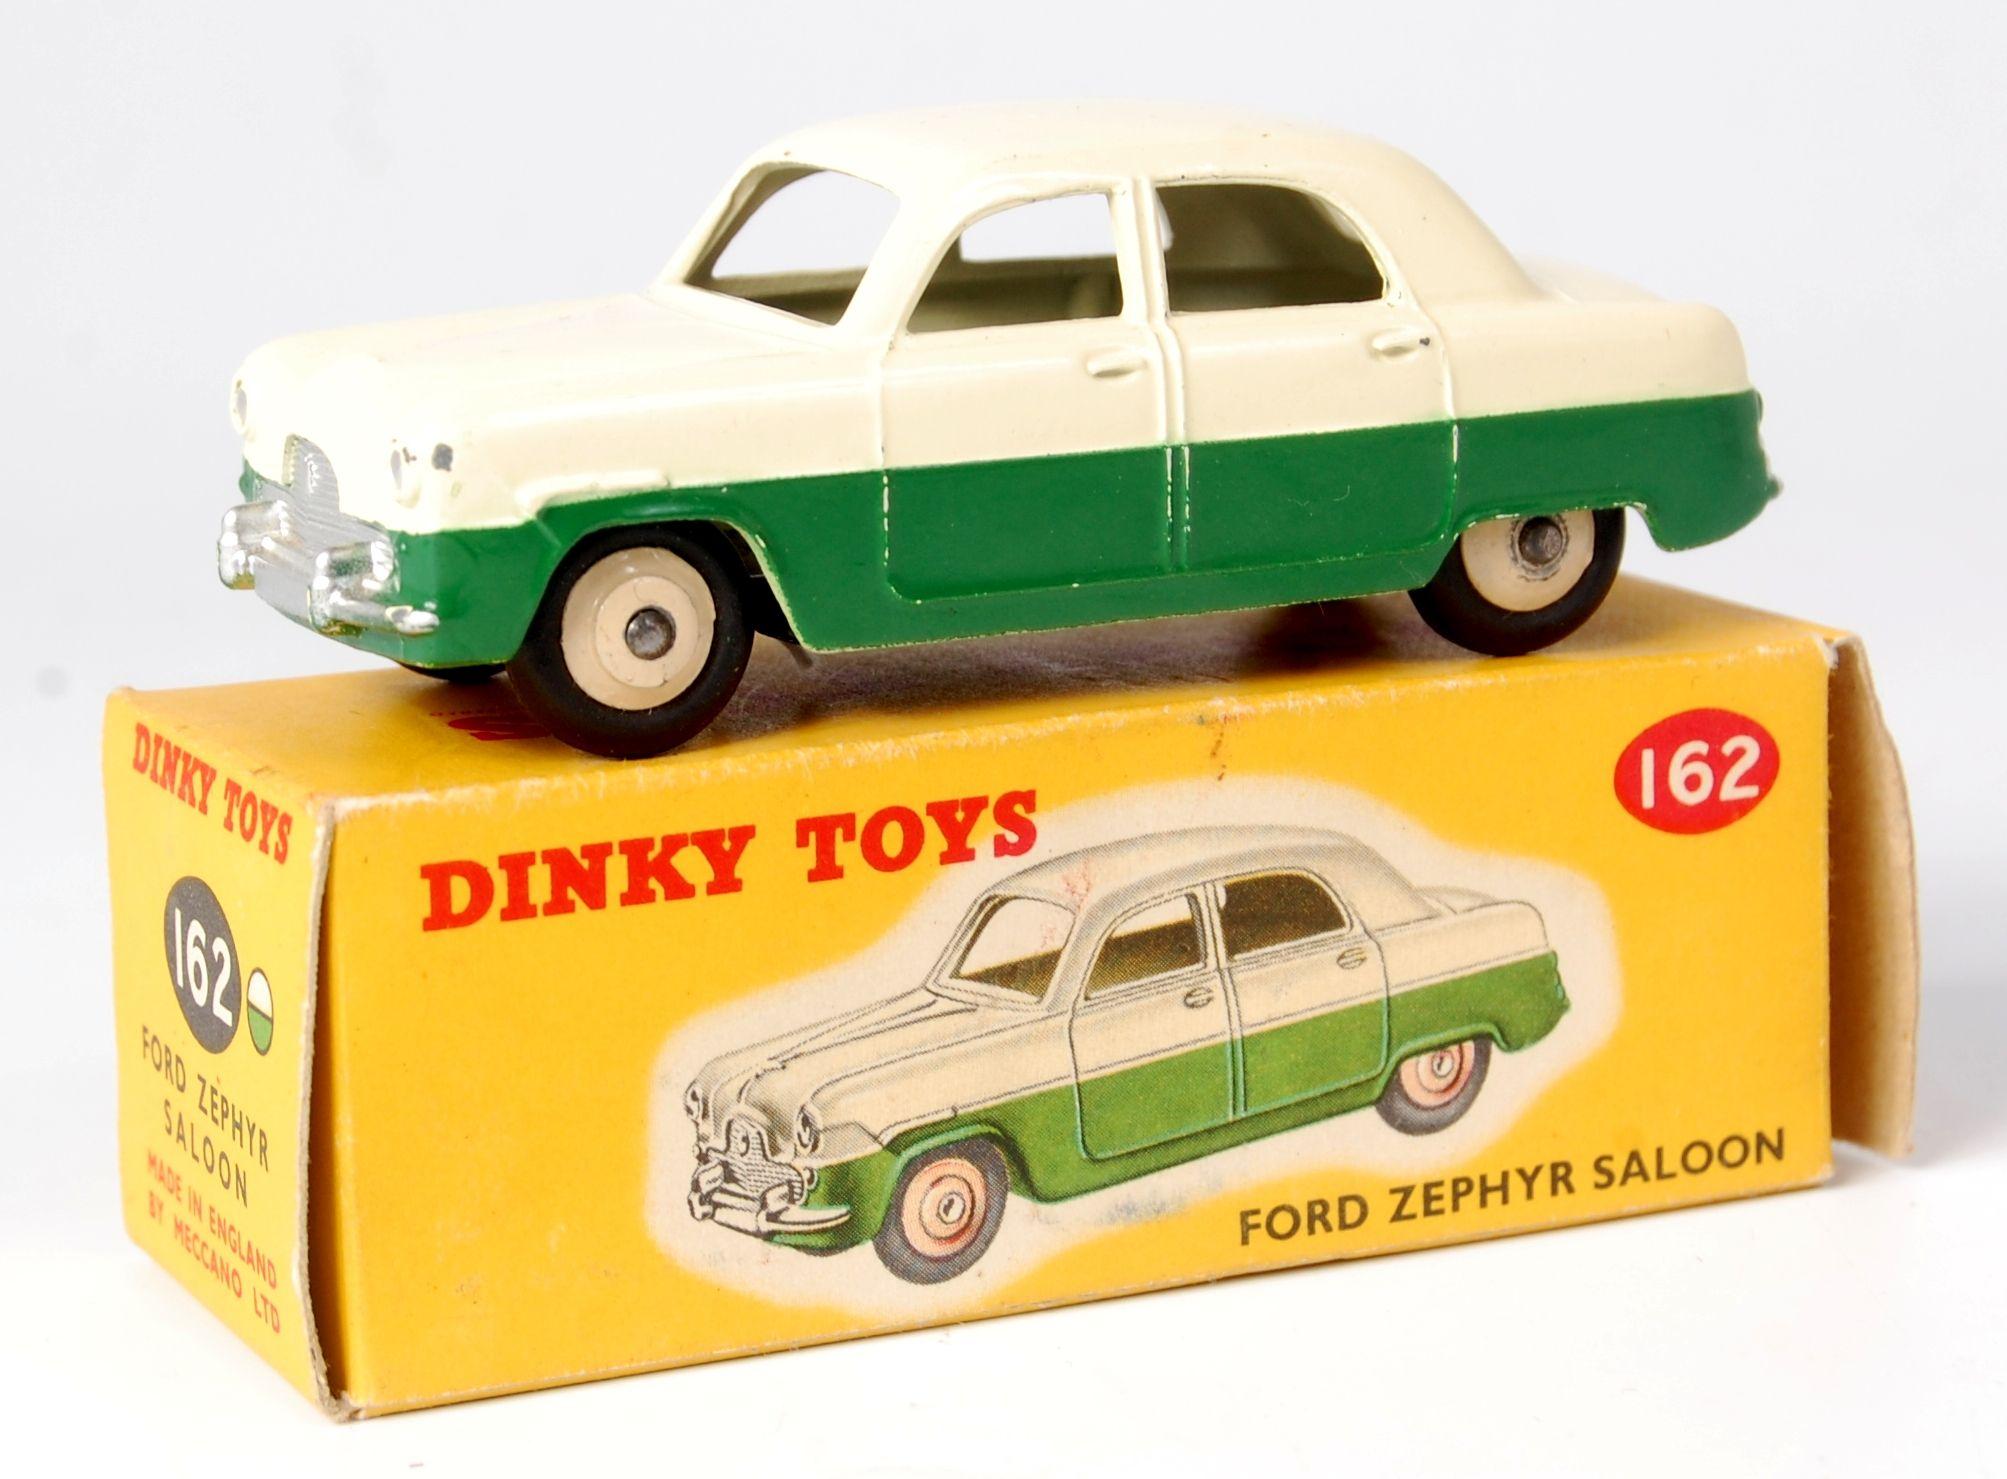 Lot 2003 Dinky Toys 162 Ford Zephyr Saloon Cream Upper Body